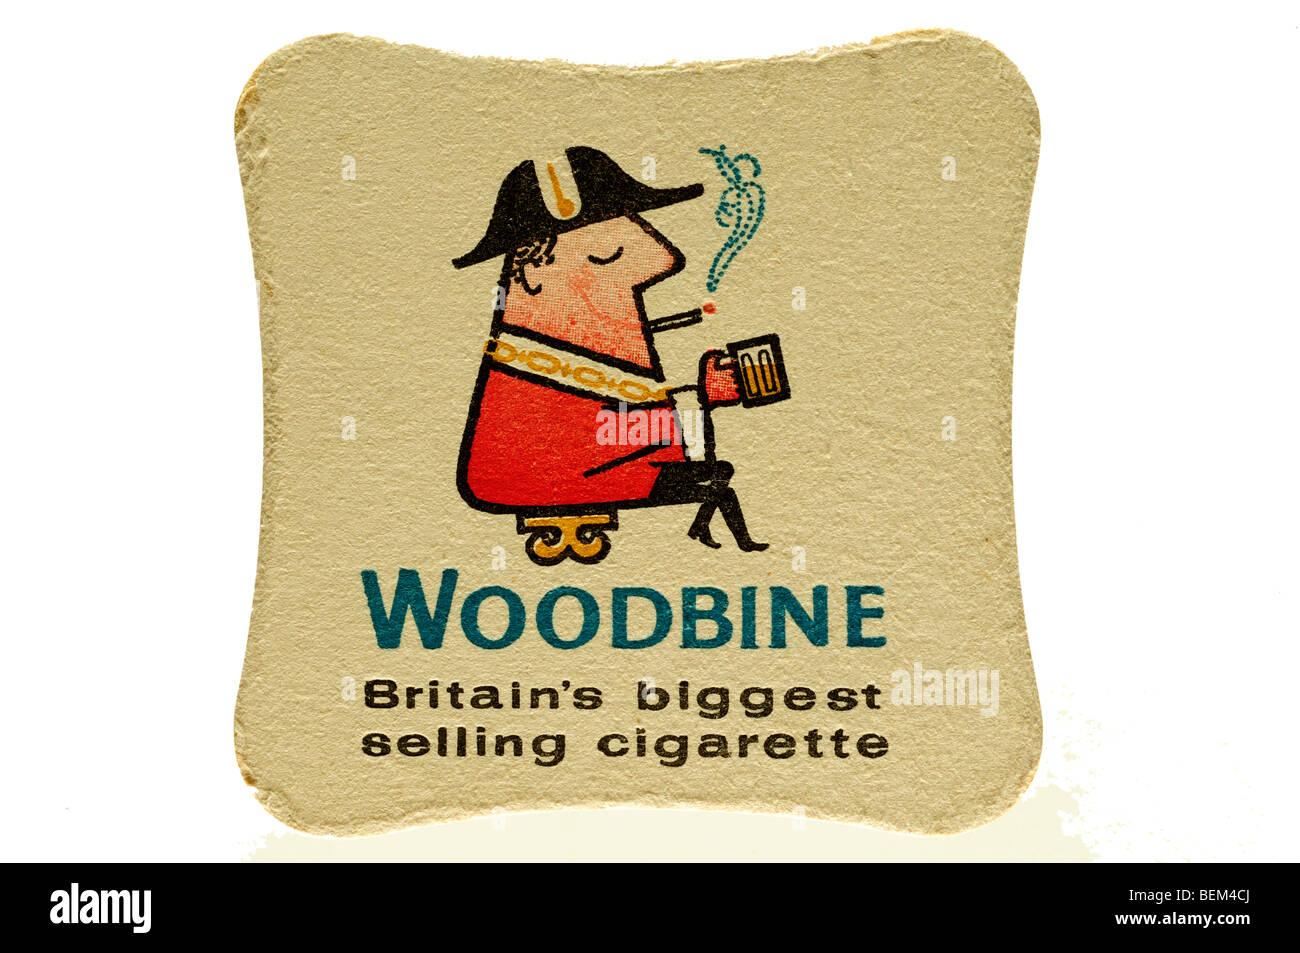 Davidoff cigarettes ring